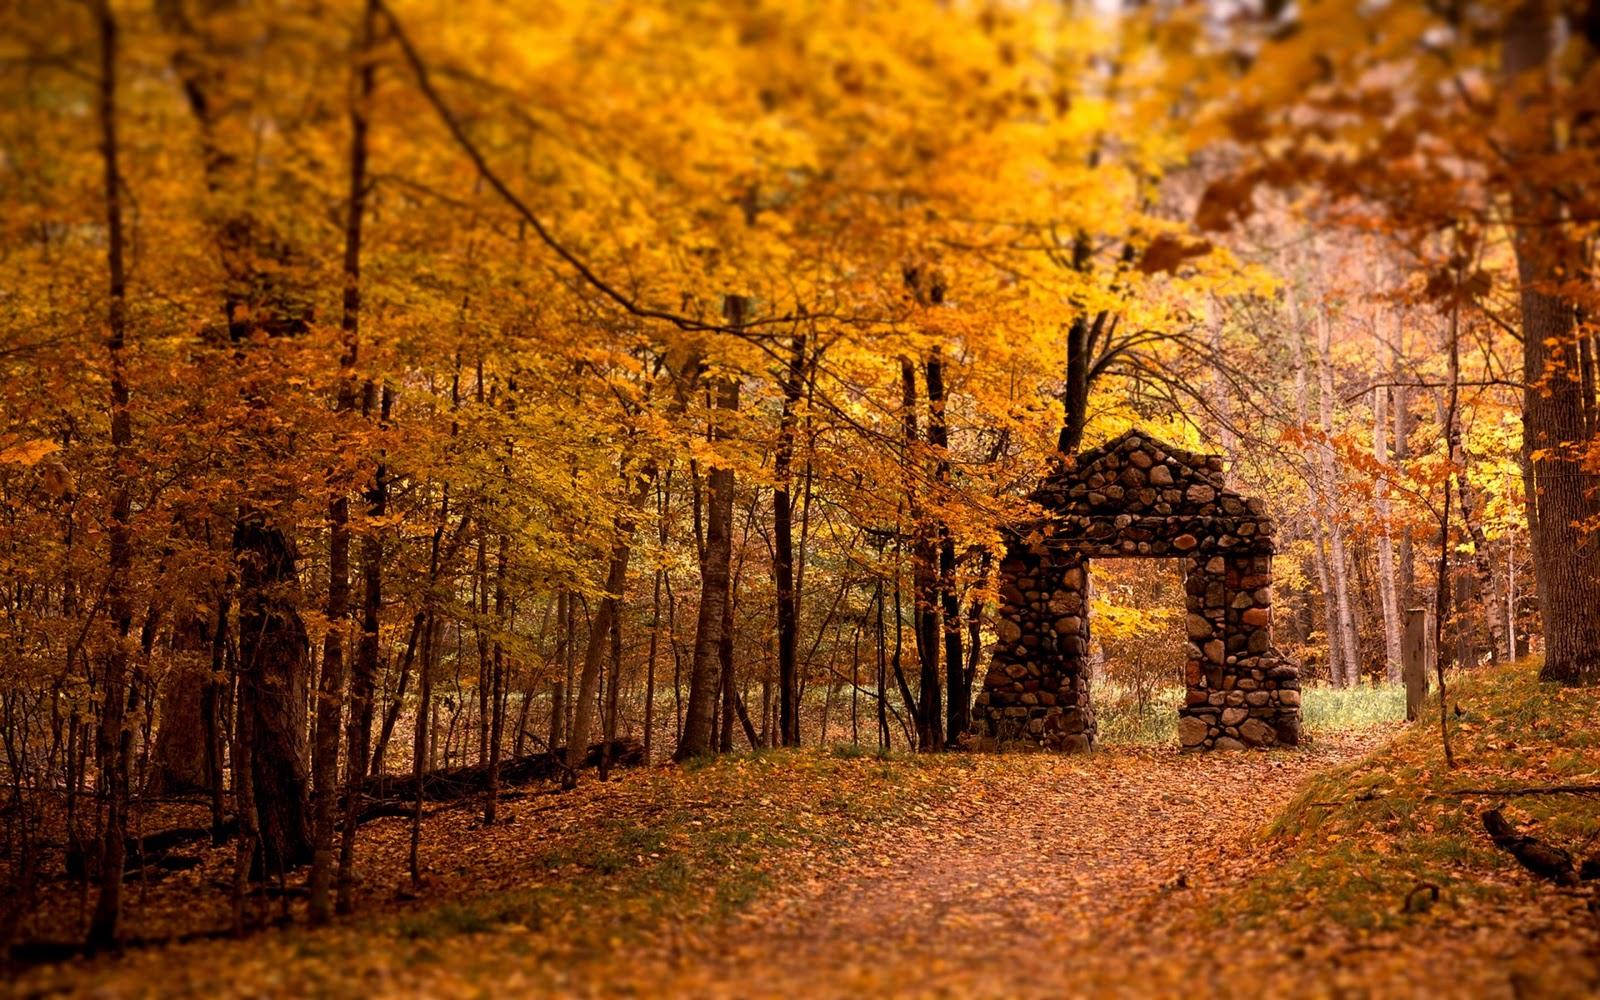 autumn wallpaper for windows 7jpg 1600x1000